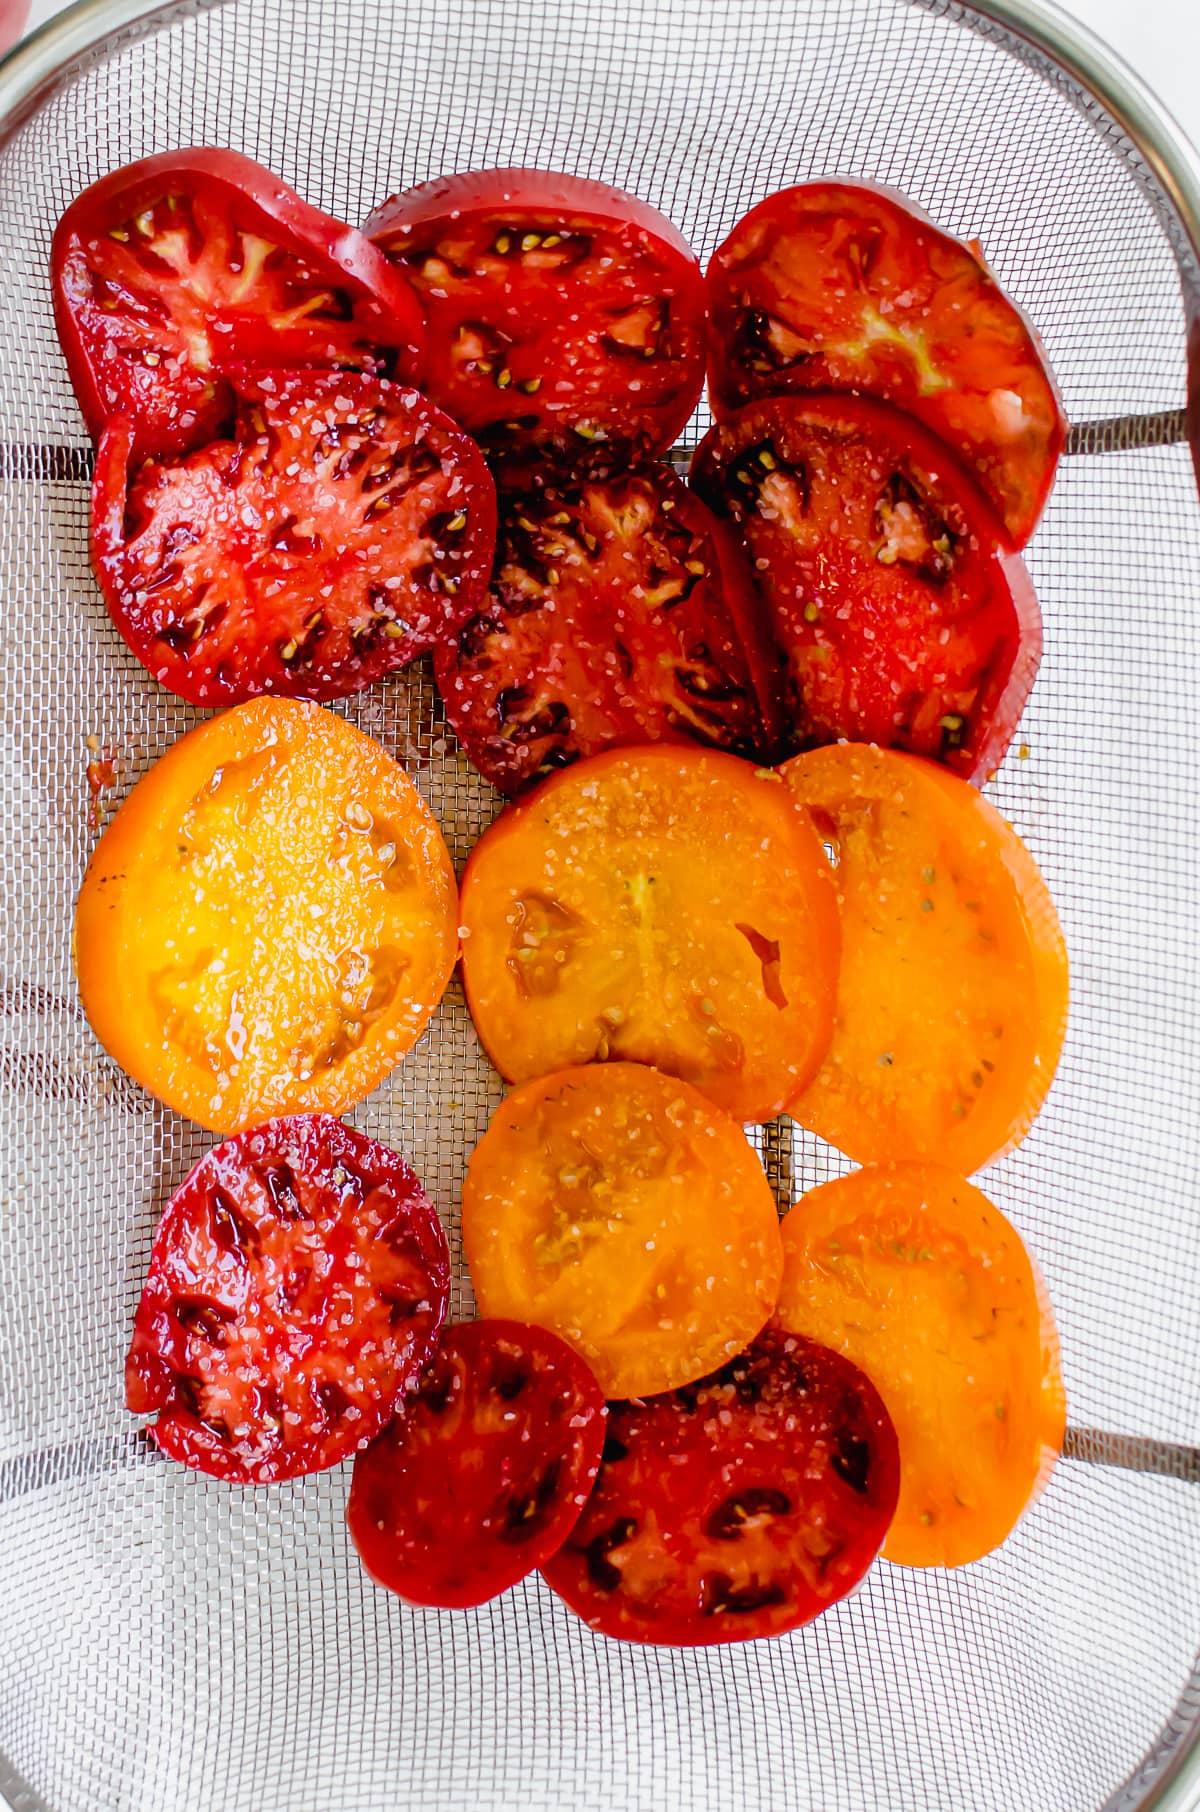 Tomato slices draining in a wire mesh colander.